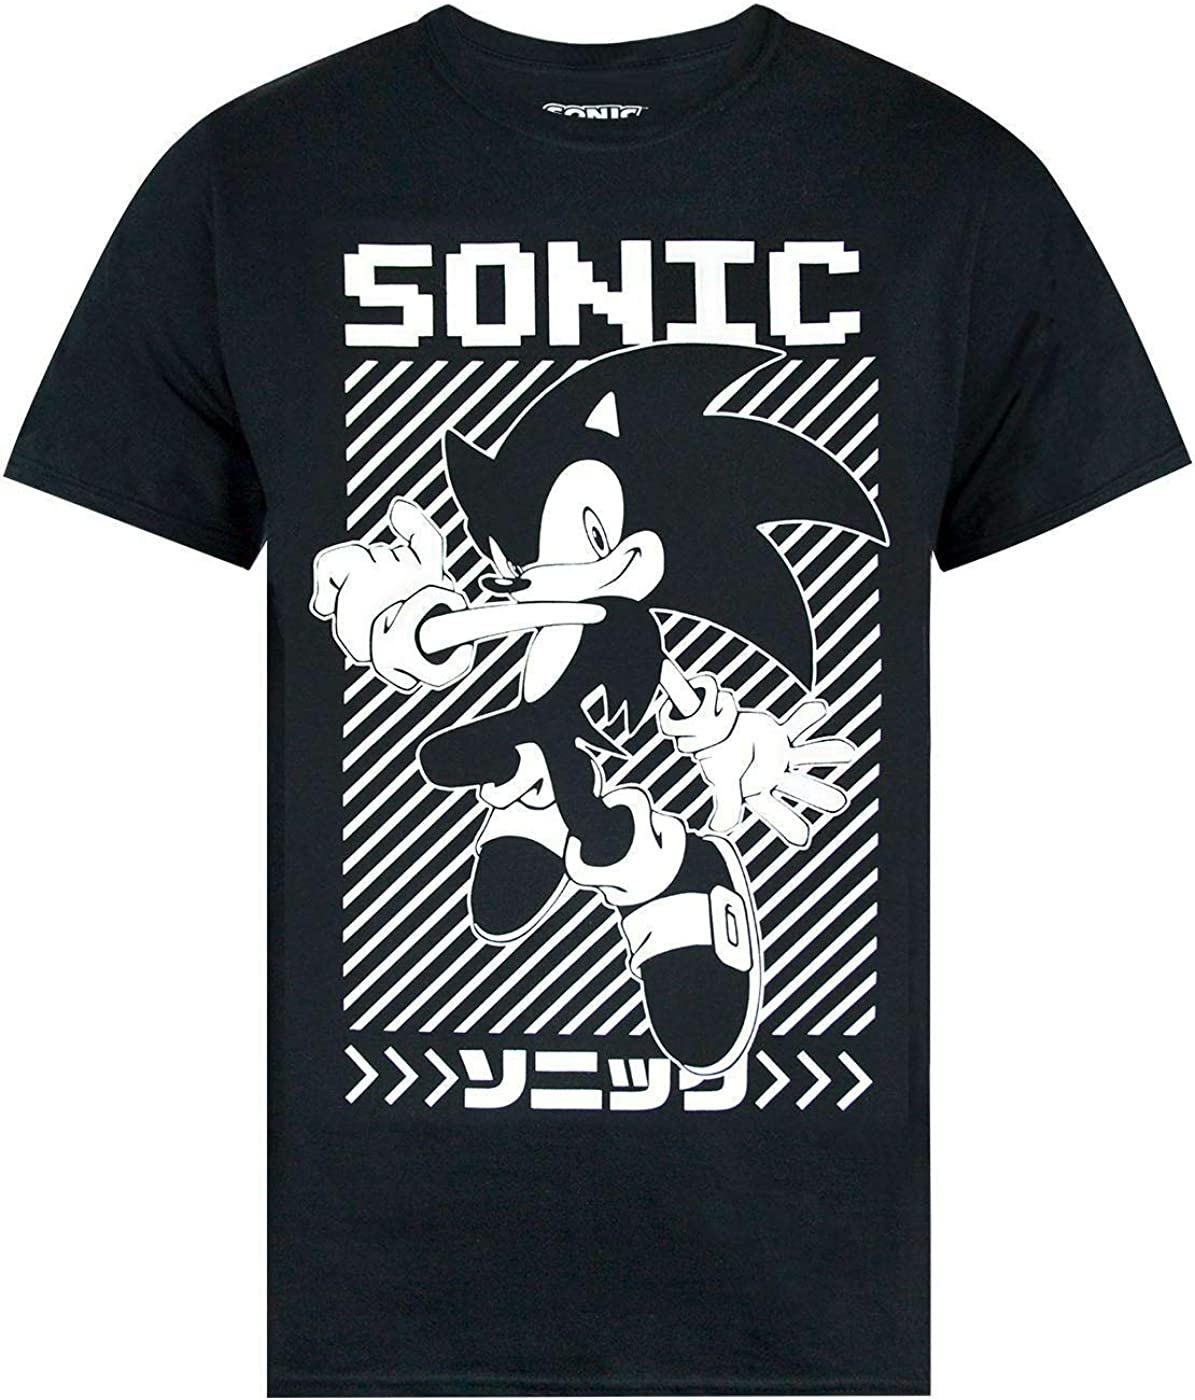 OKX Finally popular brand Sonic The Hedgehog Japanese Poster T-Shirt Super popular specialty store Men's Black